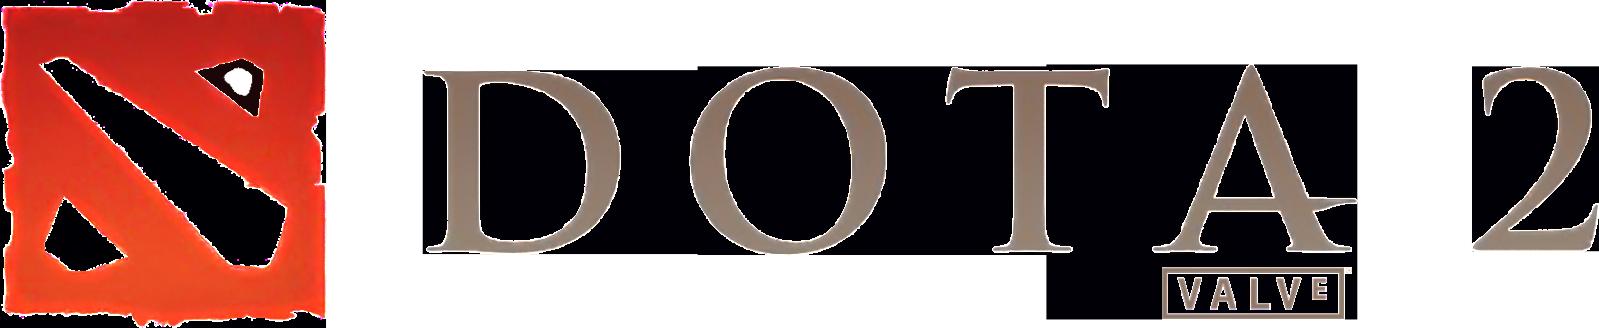 [Разное][Игра] DOTA 2